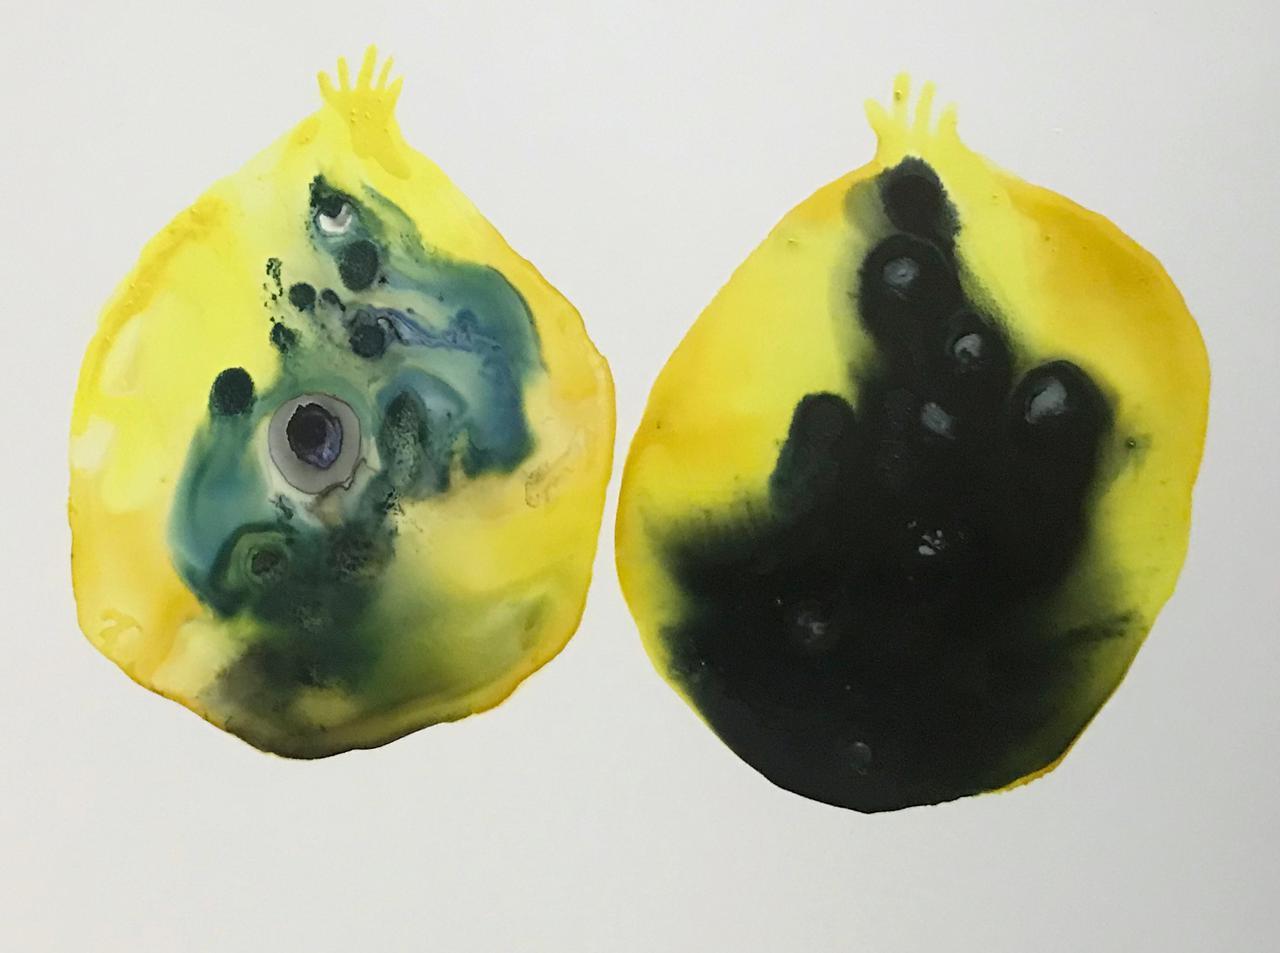 pomegranate5.jpg